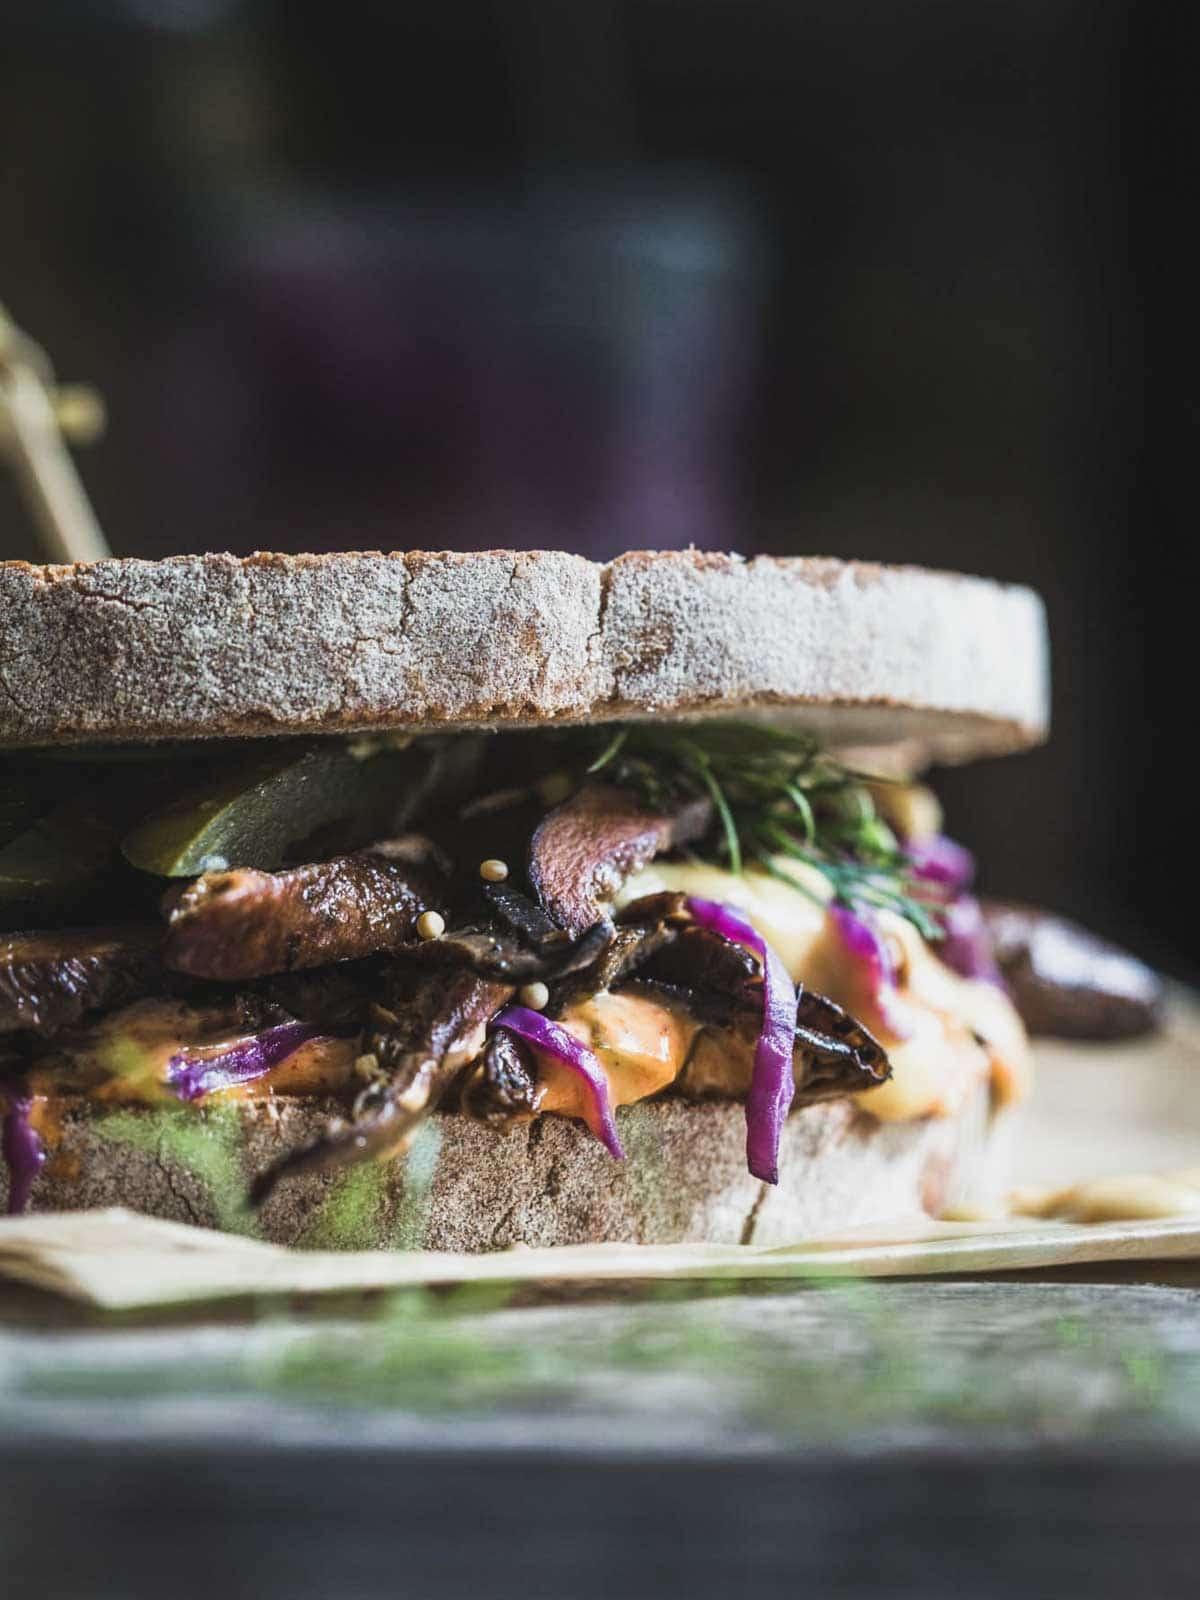 A toasted reuben sandwich close up.